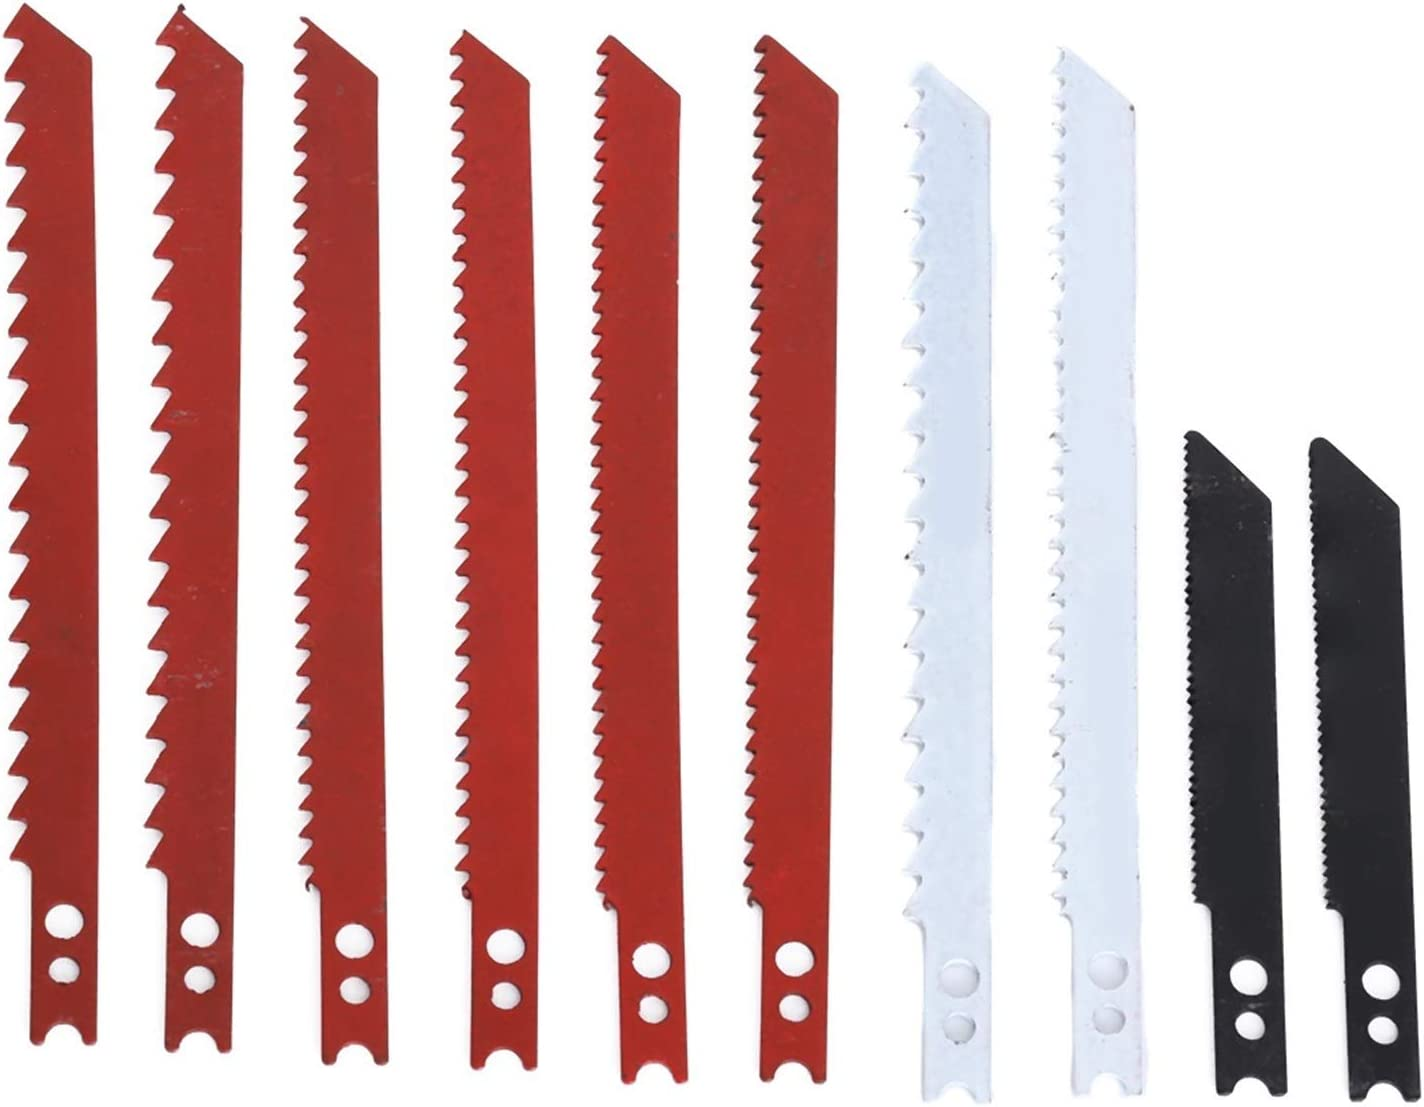 LFLQEW 10pcs Jigsaw Blades Set for Saw Jig Decker Met and Under blast sales Price reduction Black